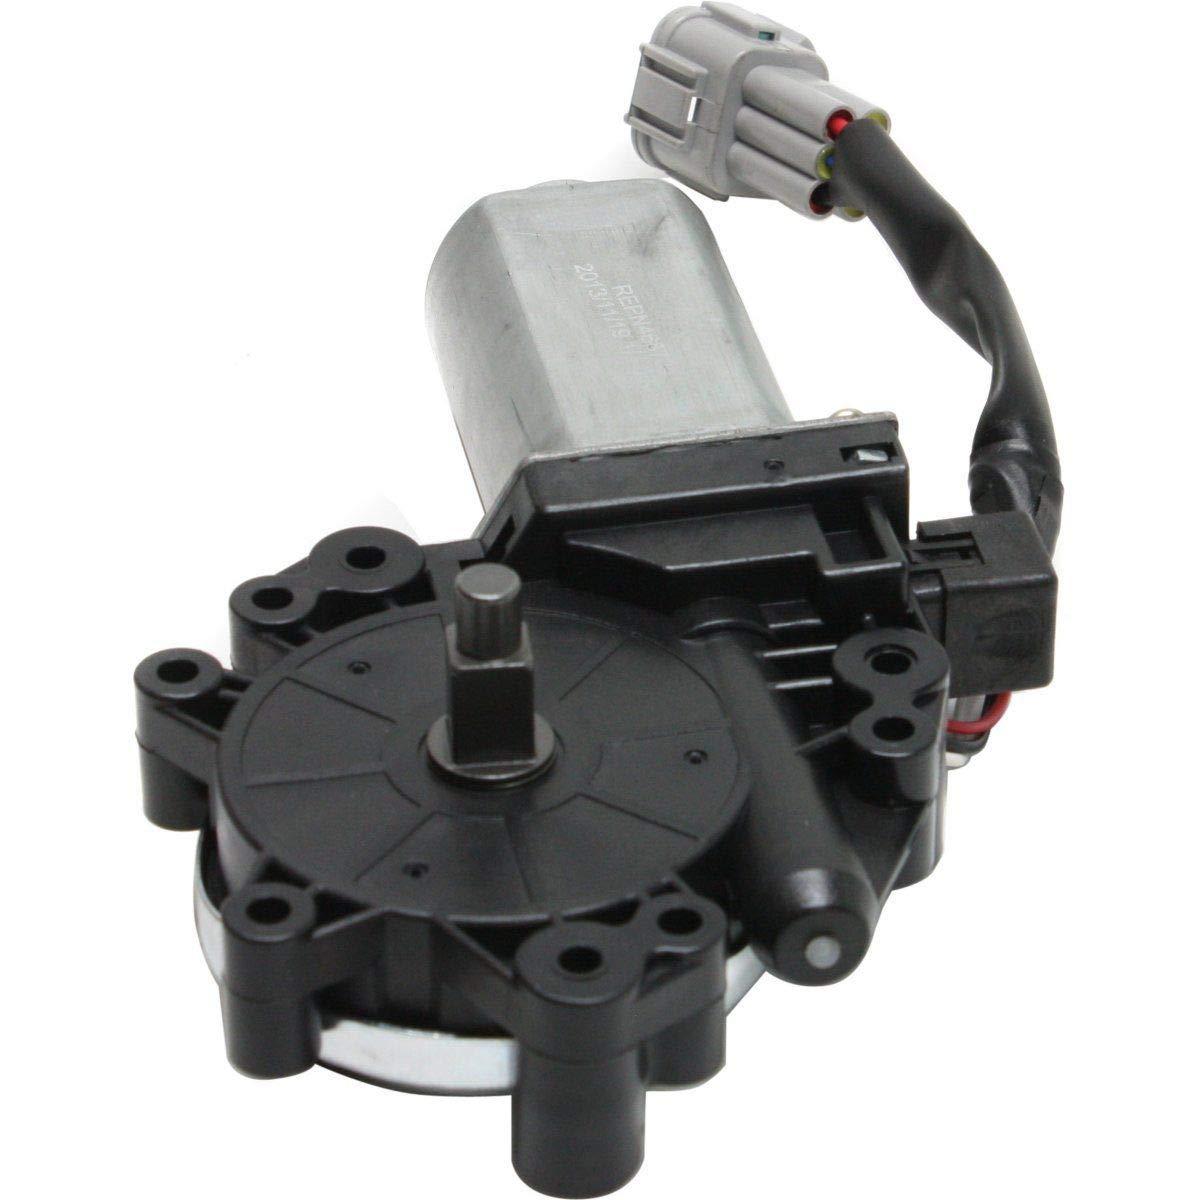 Front Driver Side Window Motor for Infiniti Nissan Armada Titan fits REPN468704